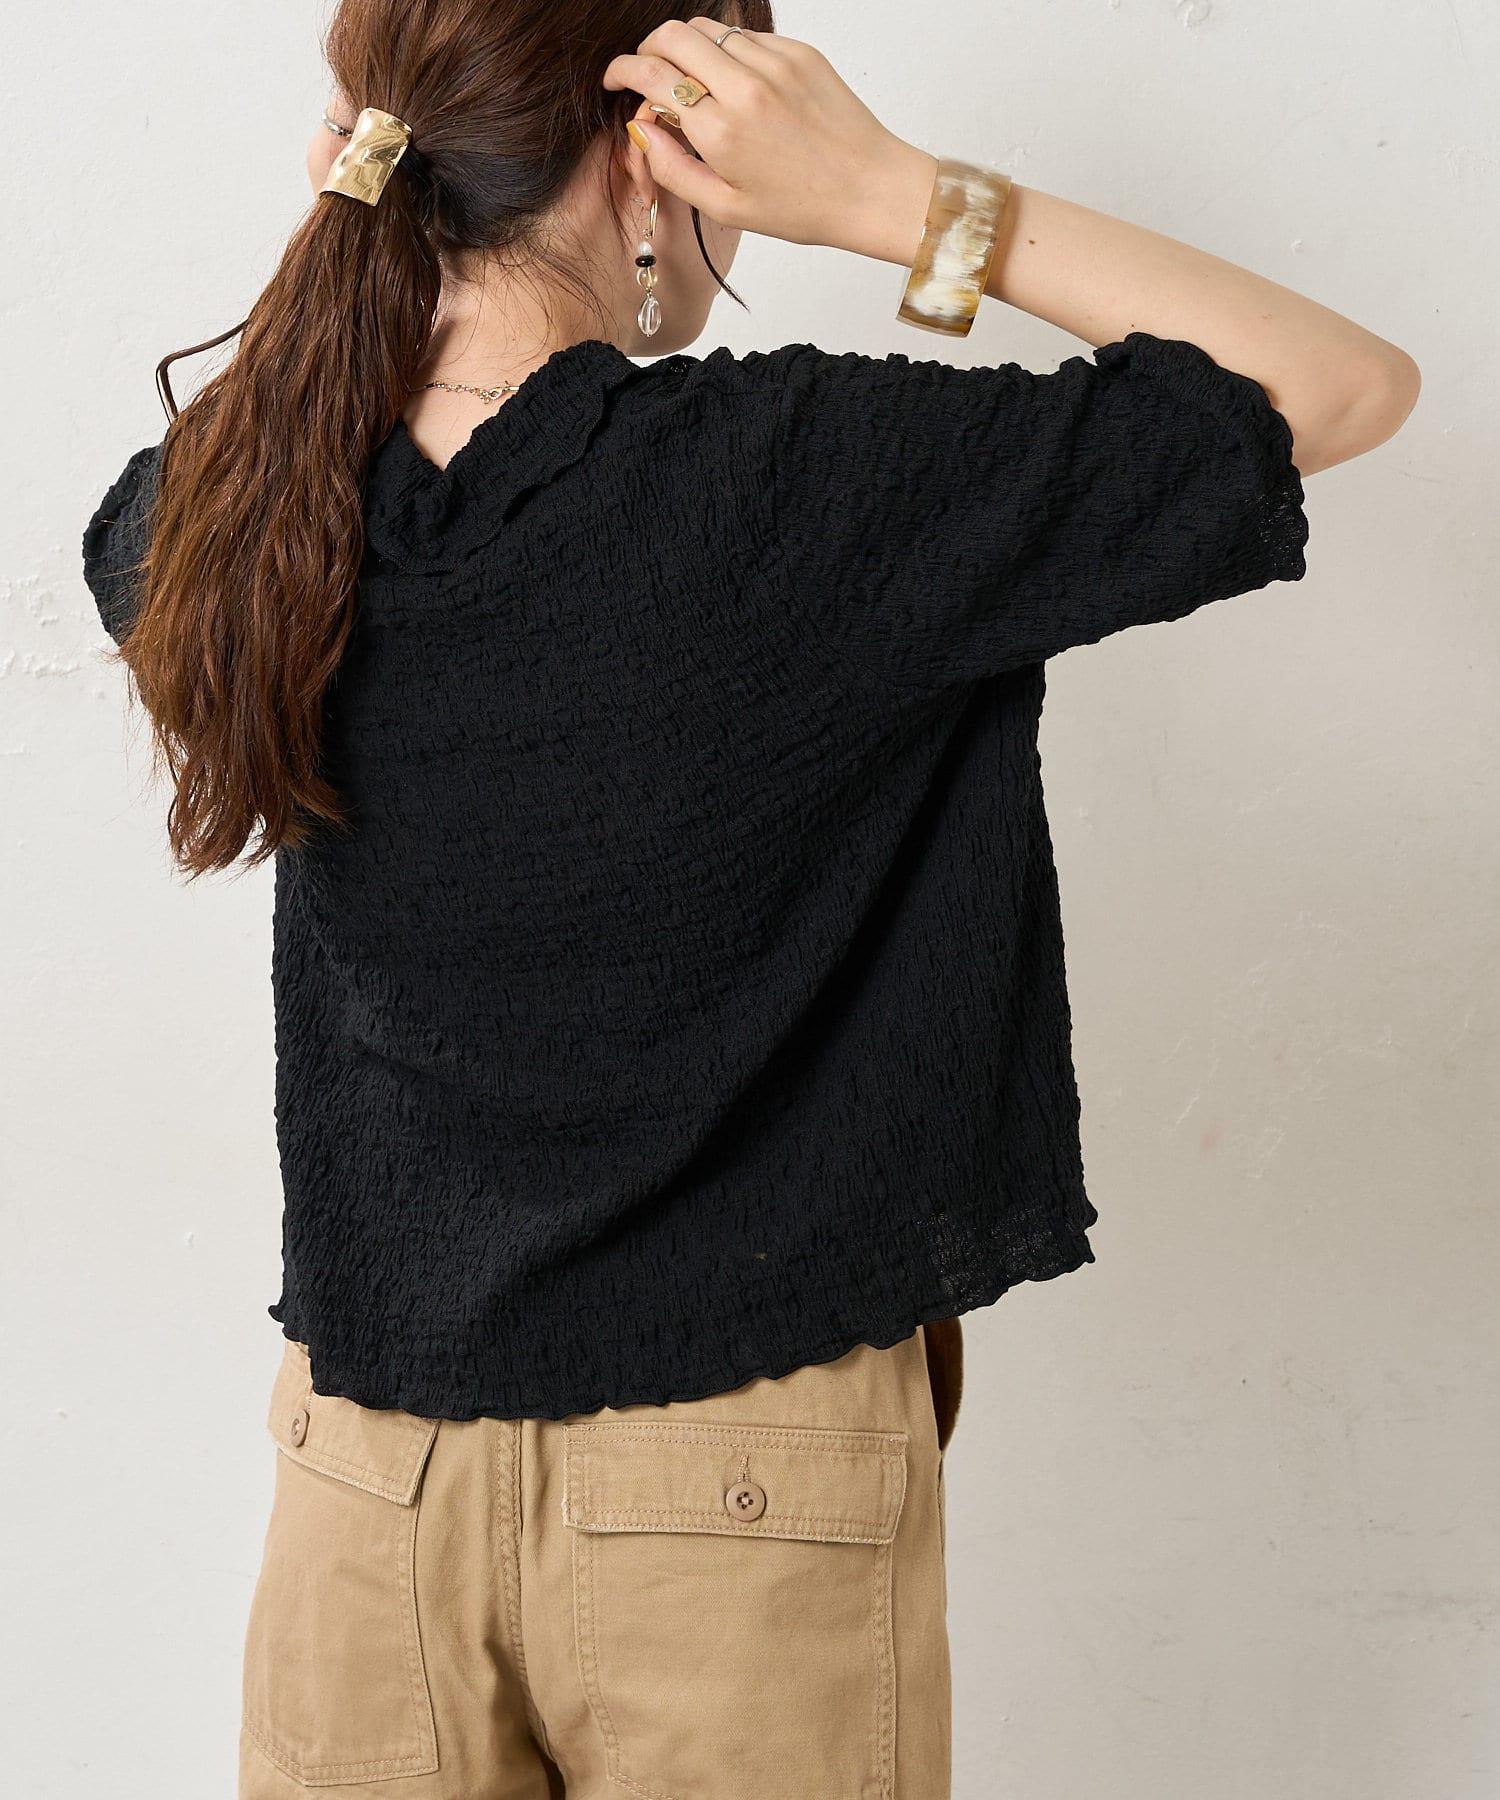 Discoat(ディスコート) 【WEB限定】ぽこぽこシャーリング開襟シャツ